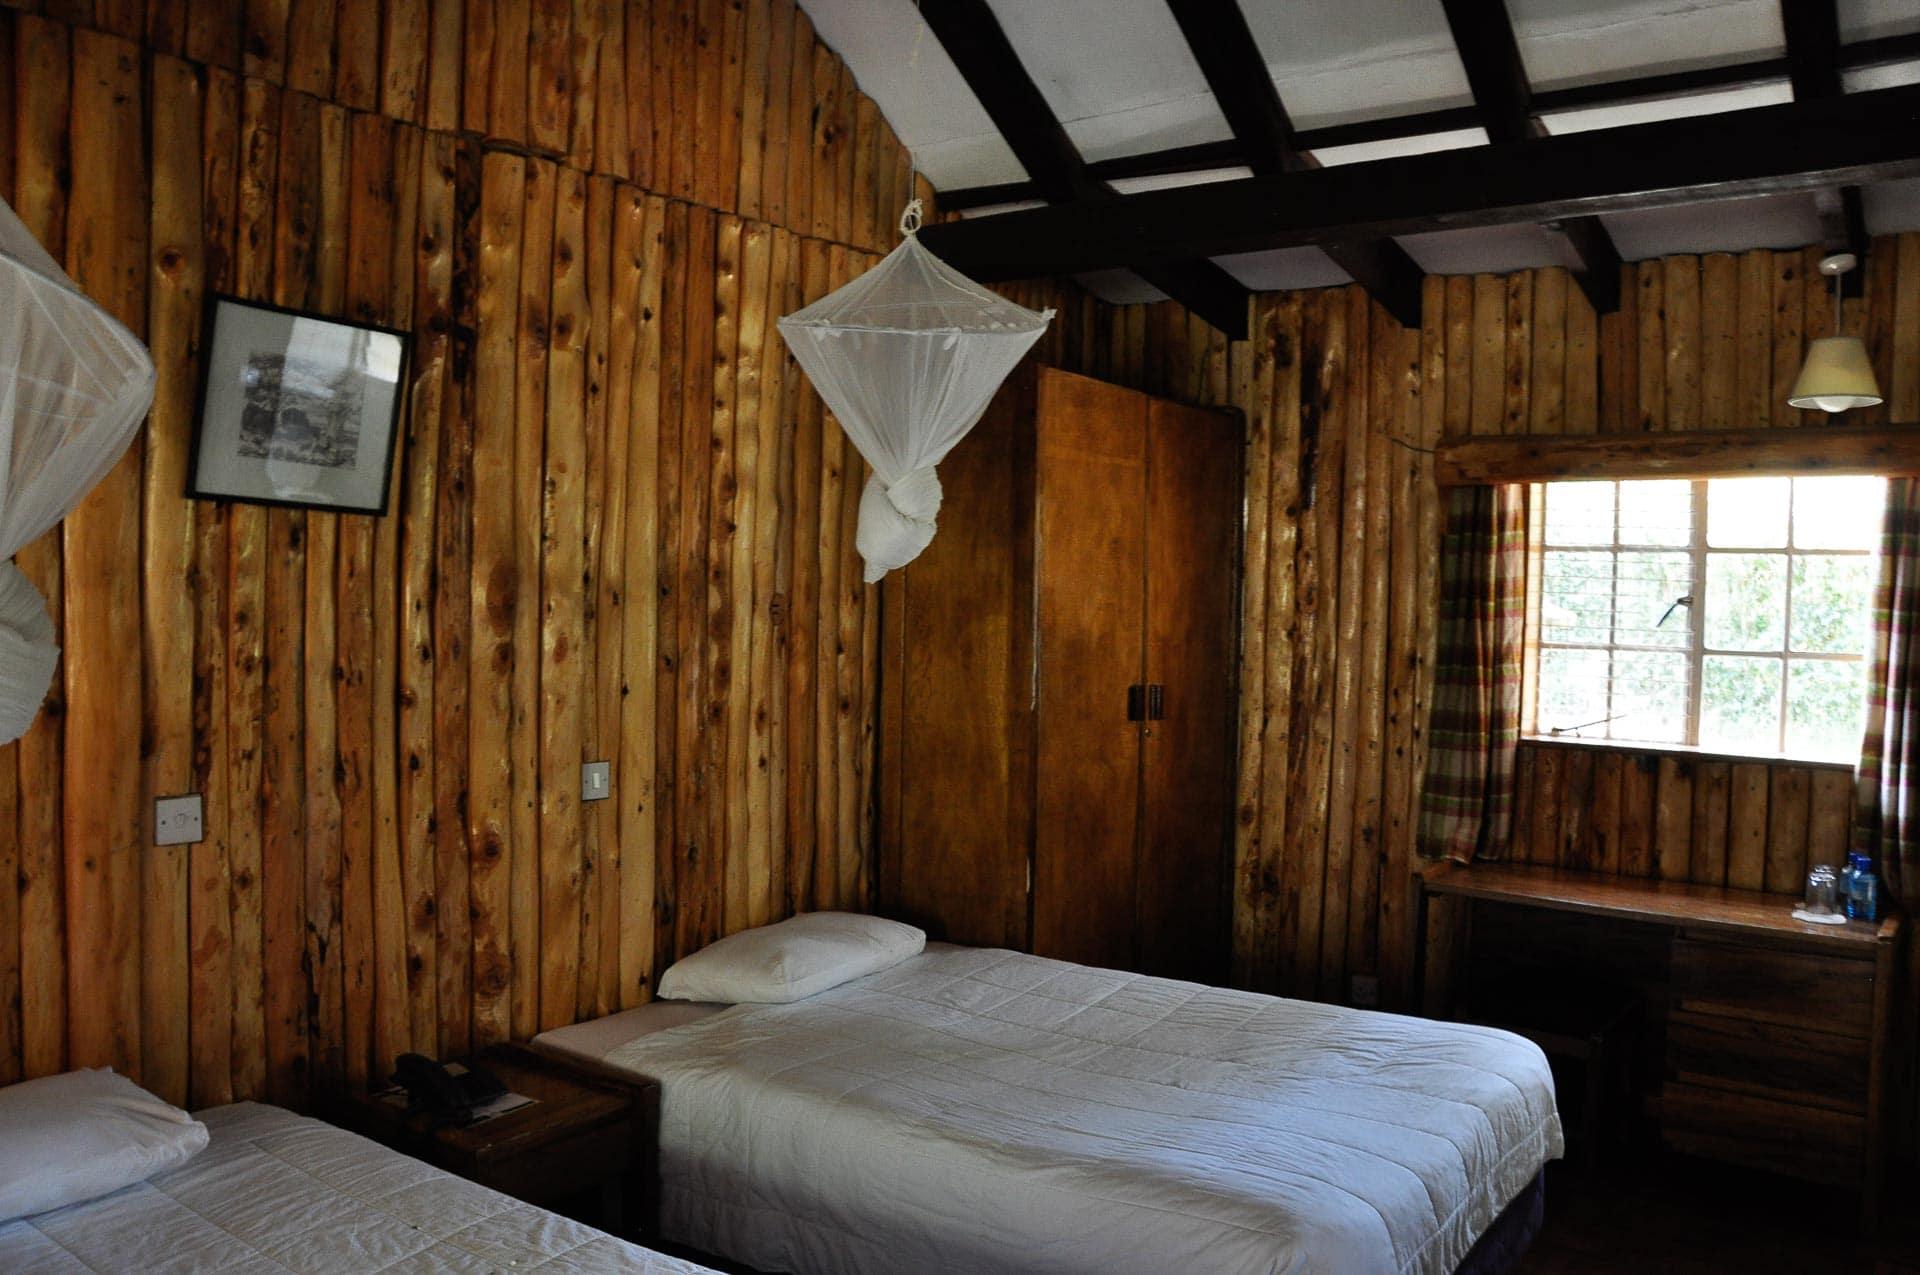 Naro-Moru-River-Lodge-Kenia-Globetrotter-Select-2